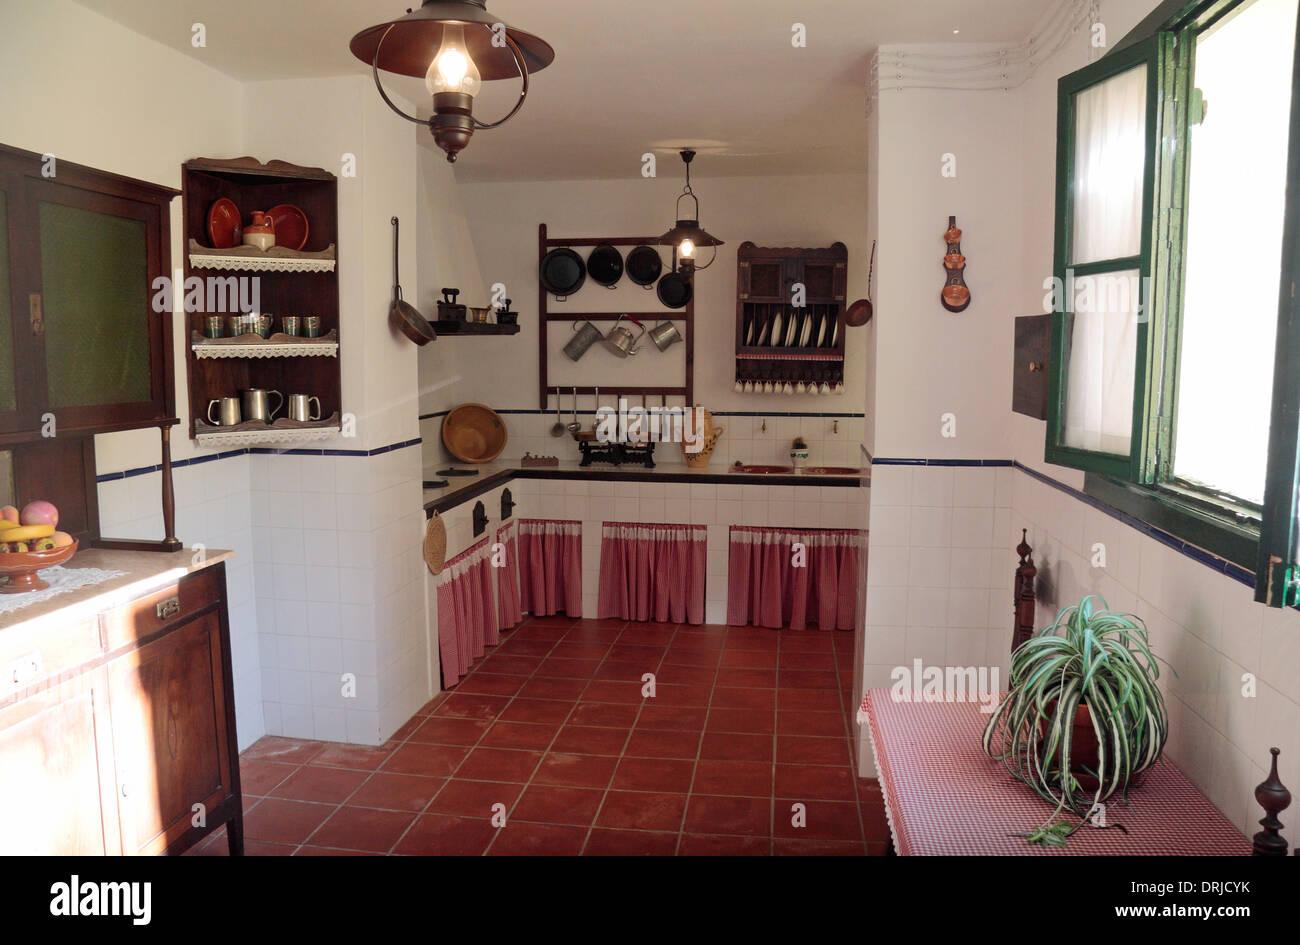 Victorian Style Houses Stockfotos & Victorian Style Houses Bilder ...